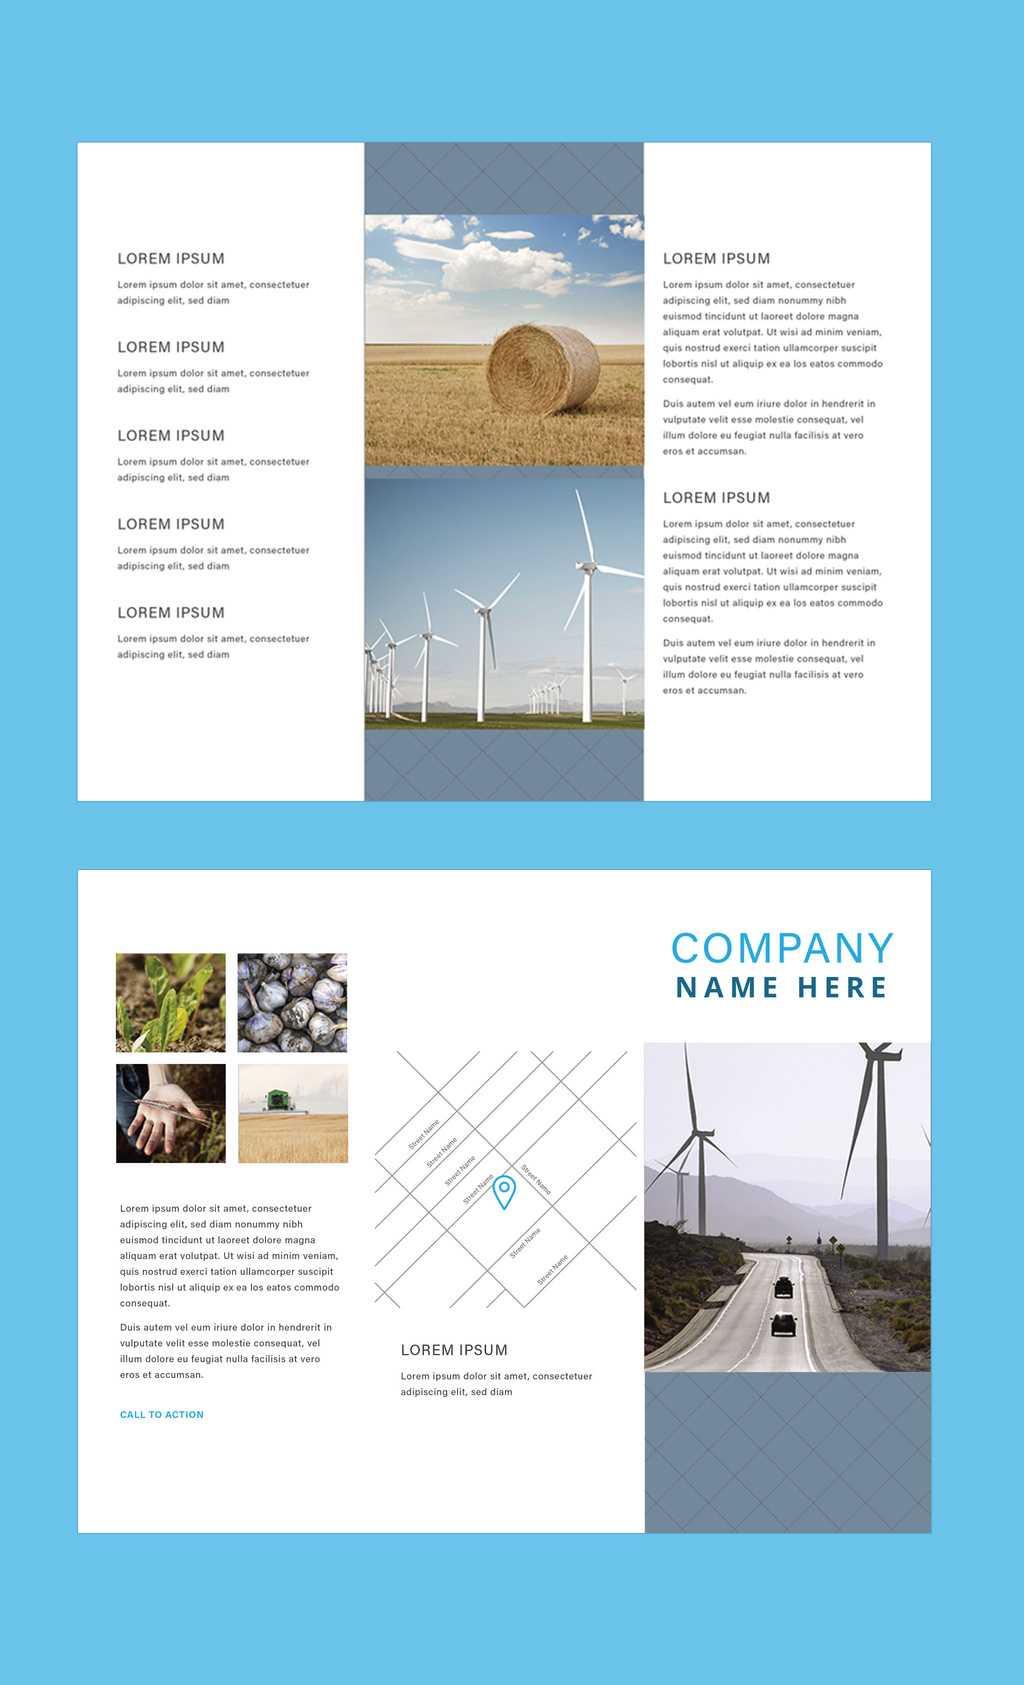 Professional Brochure Templates | Adobe Blog Regarding Brochure Templates Adobe Illustrator